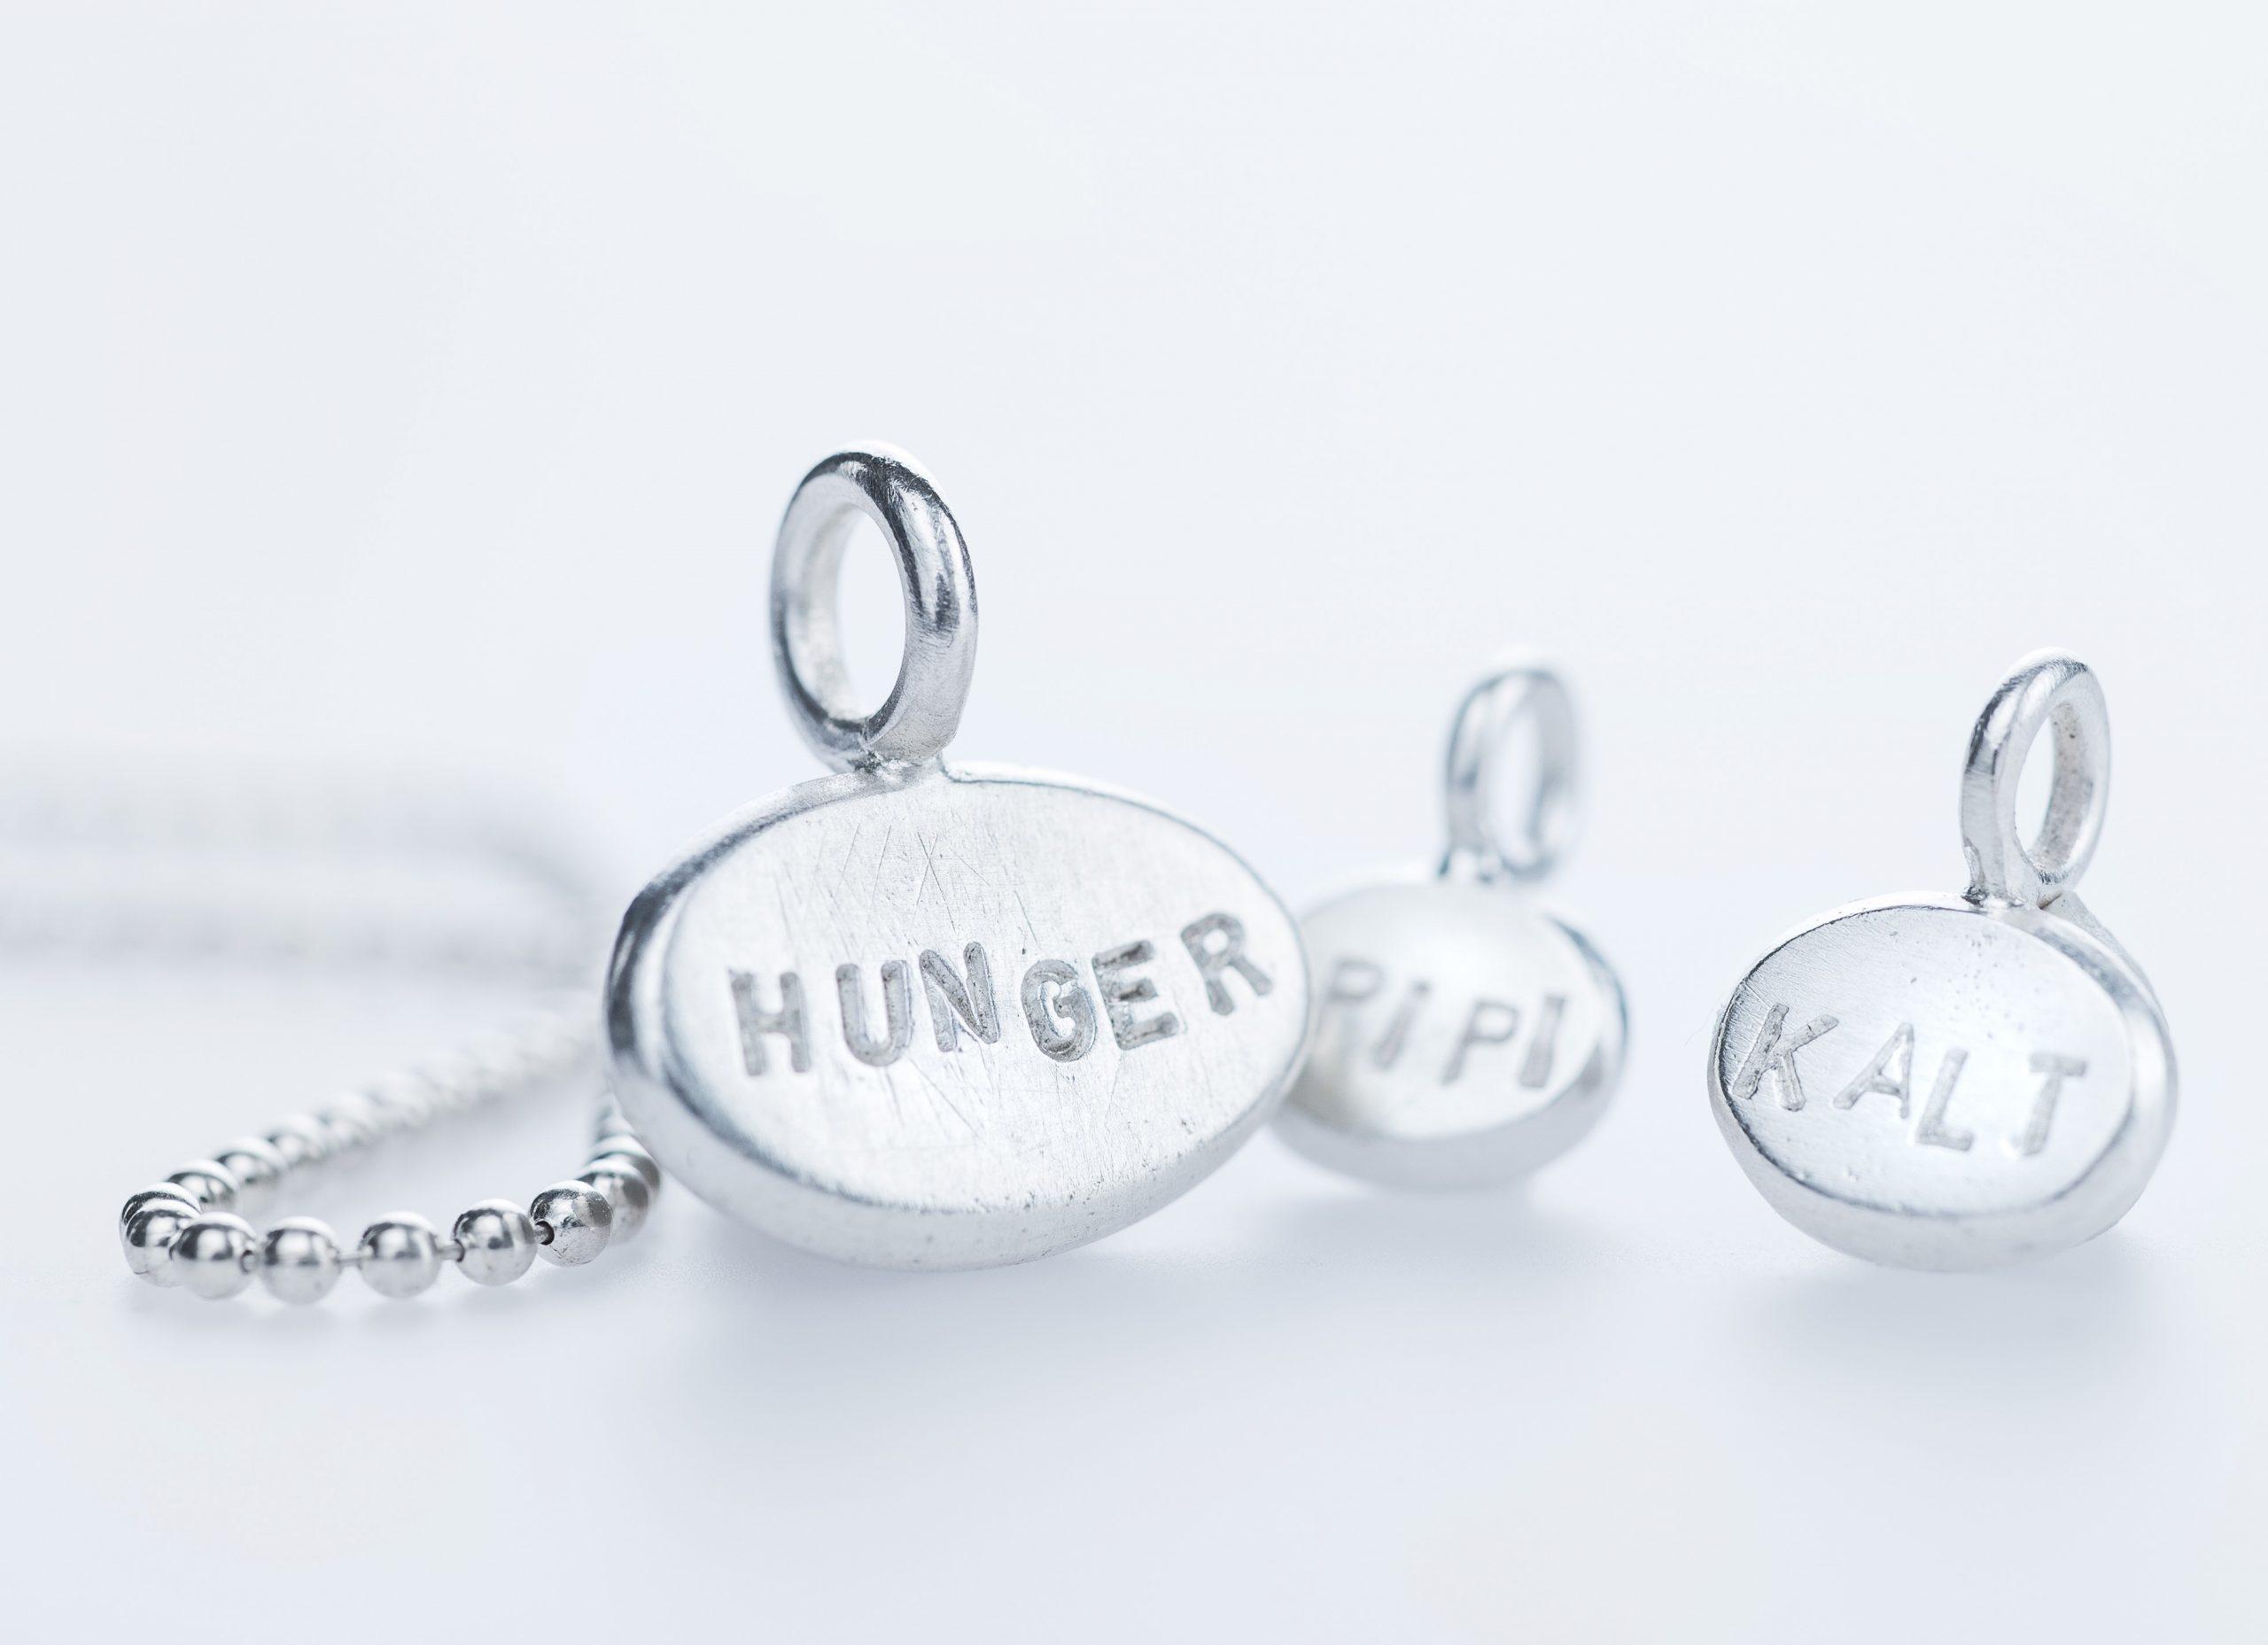 Anhänger-Silber-Hunger-Tinissima